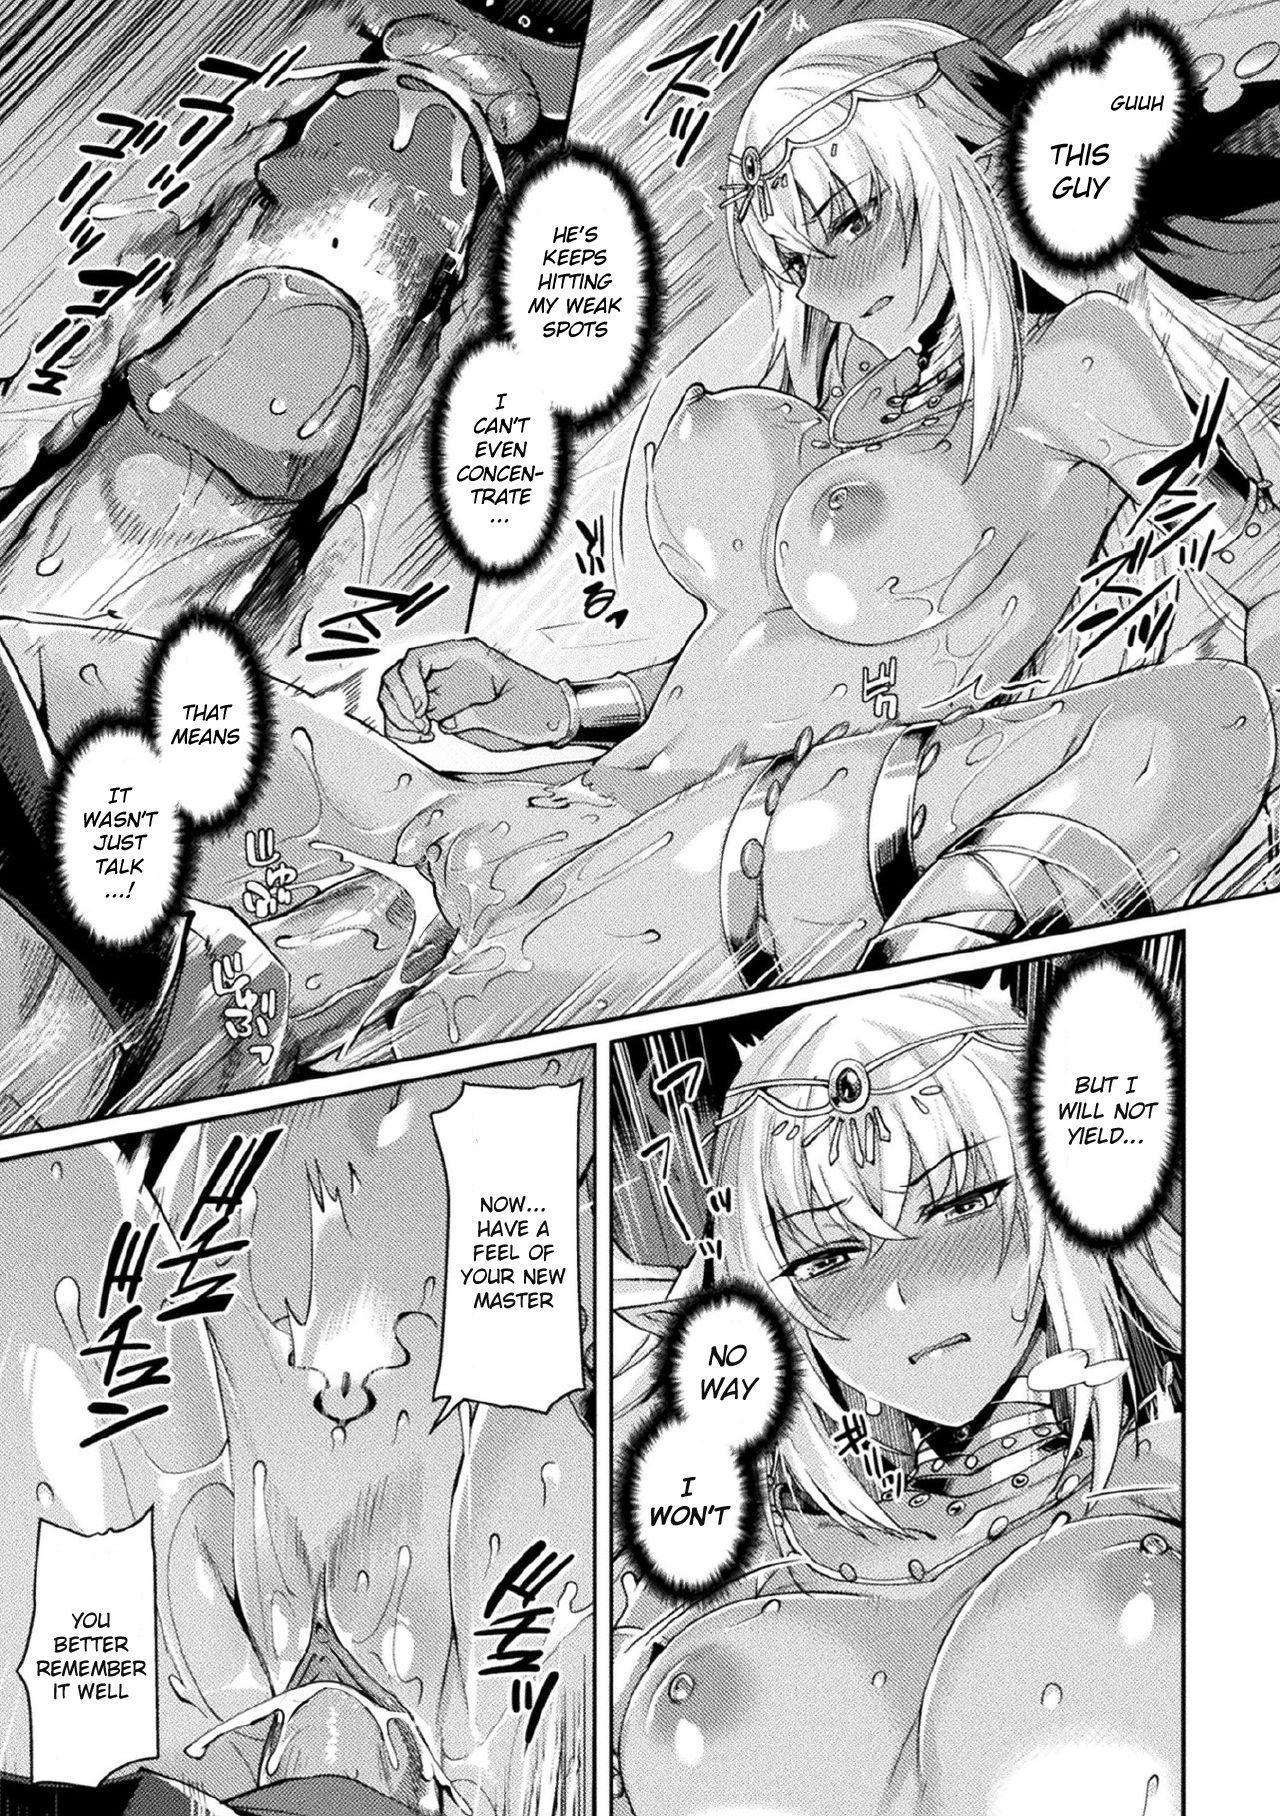 [Tsukitokage] Kuroinu II ~Inyoku ni Somaru Haitoku no Miyako, Futatabi~ THE COMIC Chapter 6 (Kukkoro Heroines Vol. 7) [English] [Klub Kemoner] [Decensored] [Digital] 14